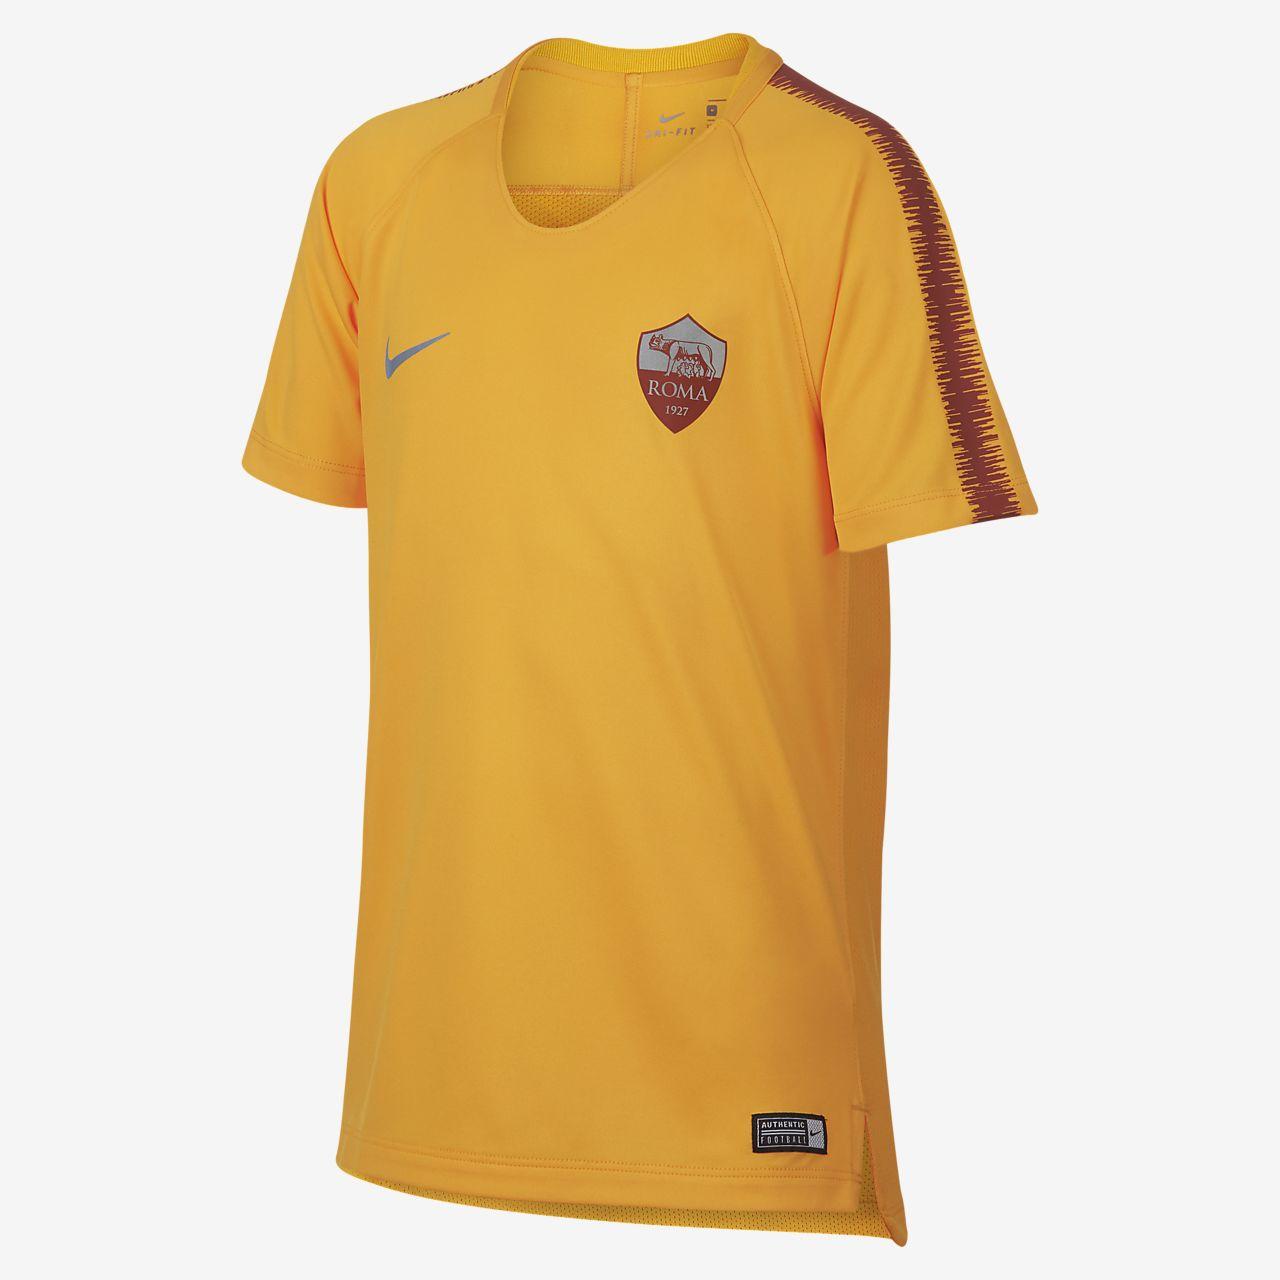 ce08d1a94 ... Camisola de futebol de manga curta Nike Breathe A.S. Roma Squad Júnior